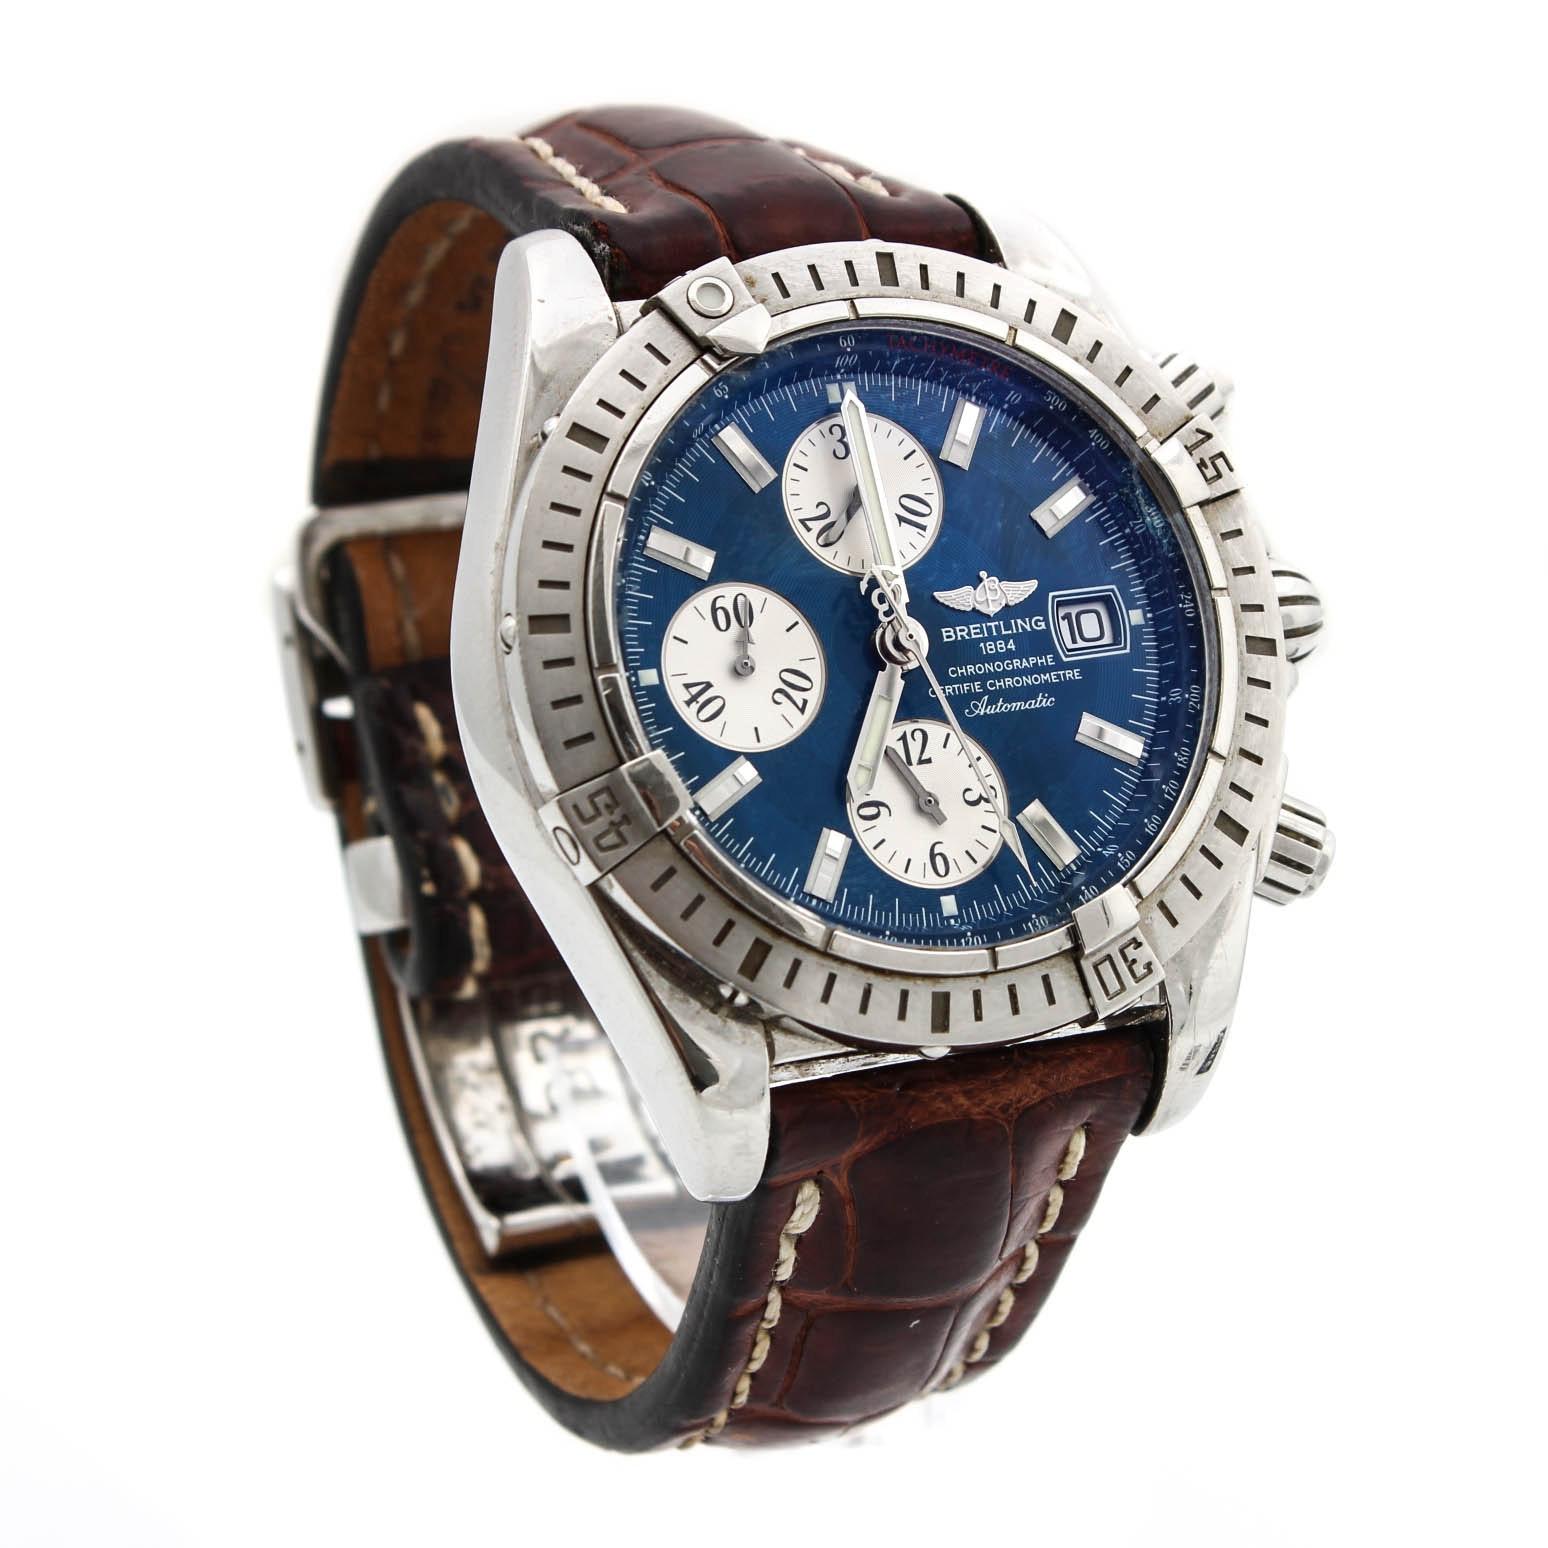 Breitling 1884 Chronographe Certifie Chronometre Automatic Wristwatch